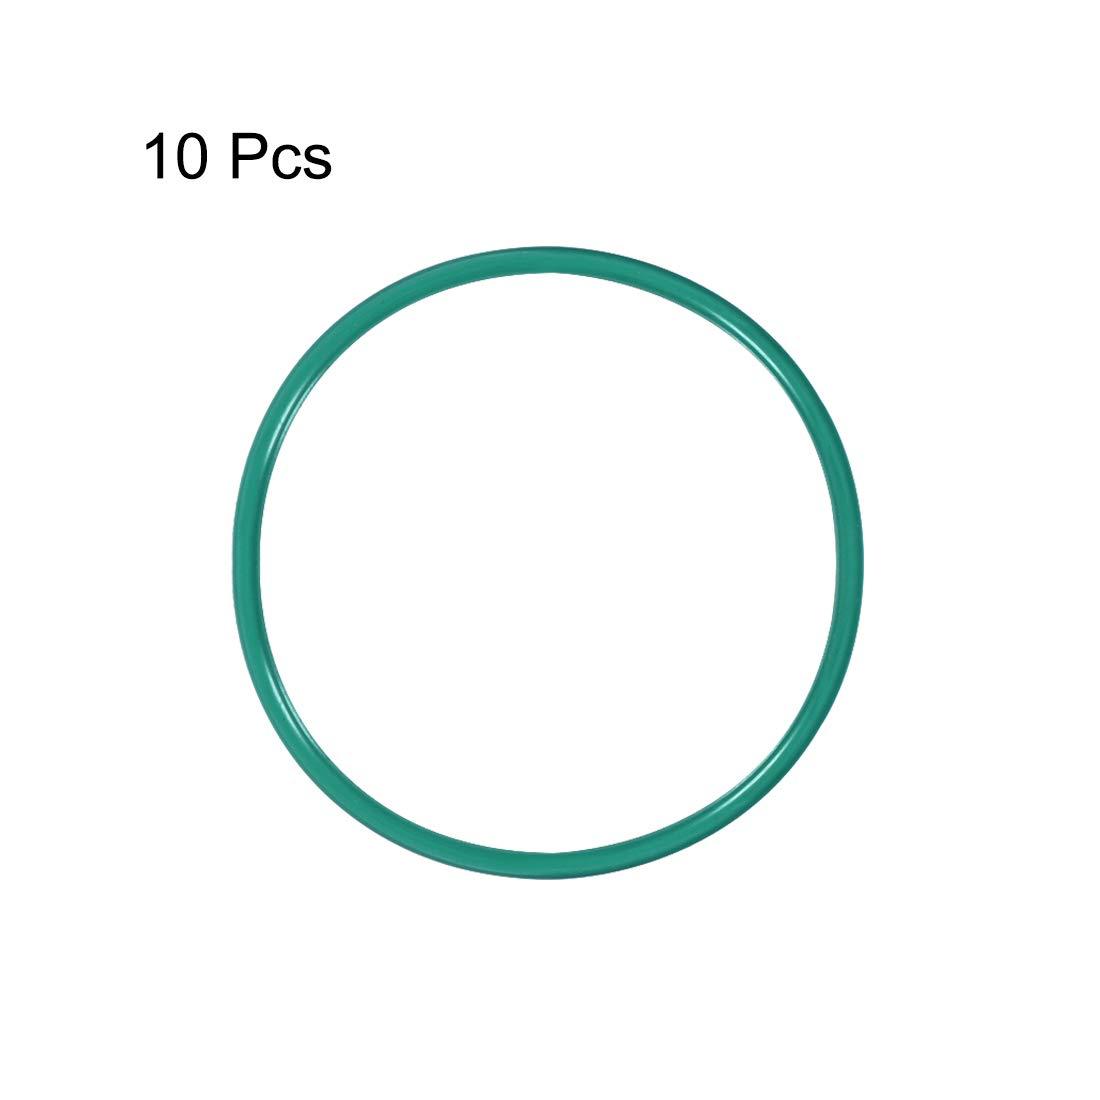 Seal Gasket Green 10Pcs 20.2mm Inner Diameter 1.9mm Width uxcell Fluorine Rubber O Rings 24mm OD